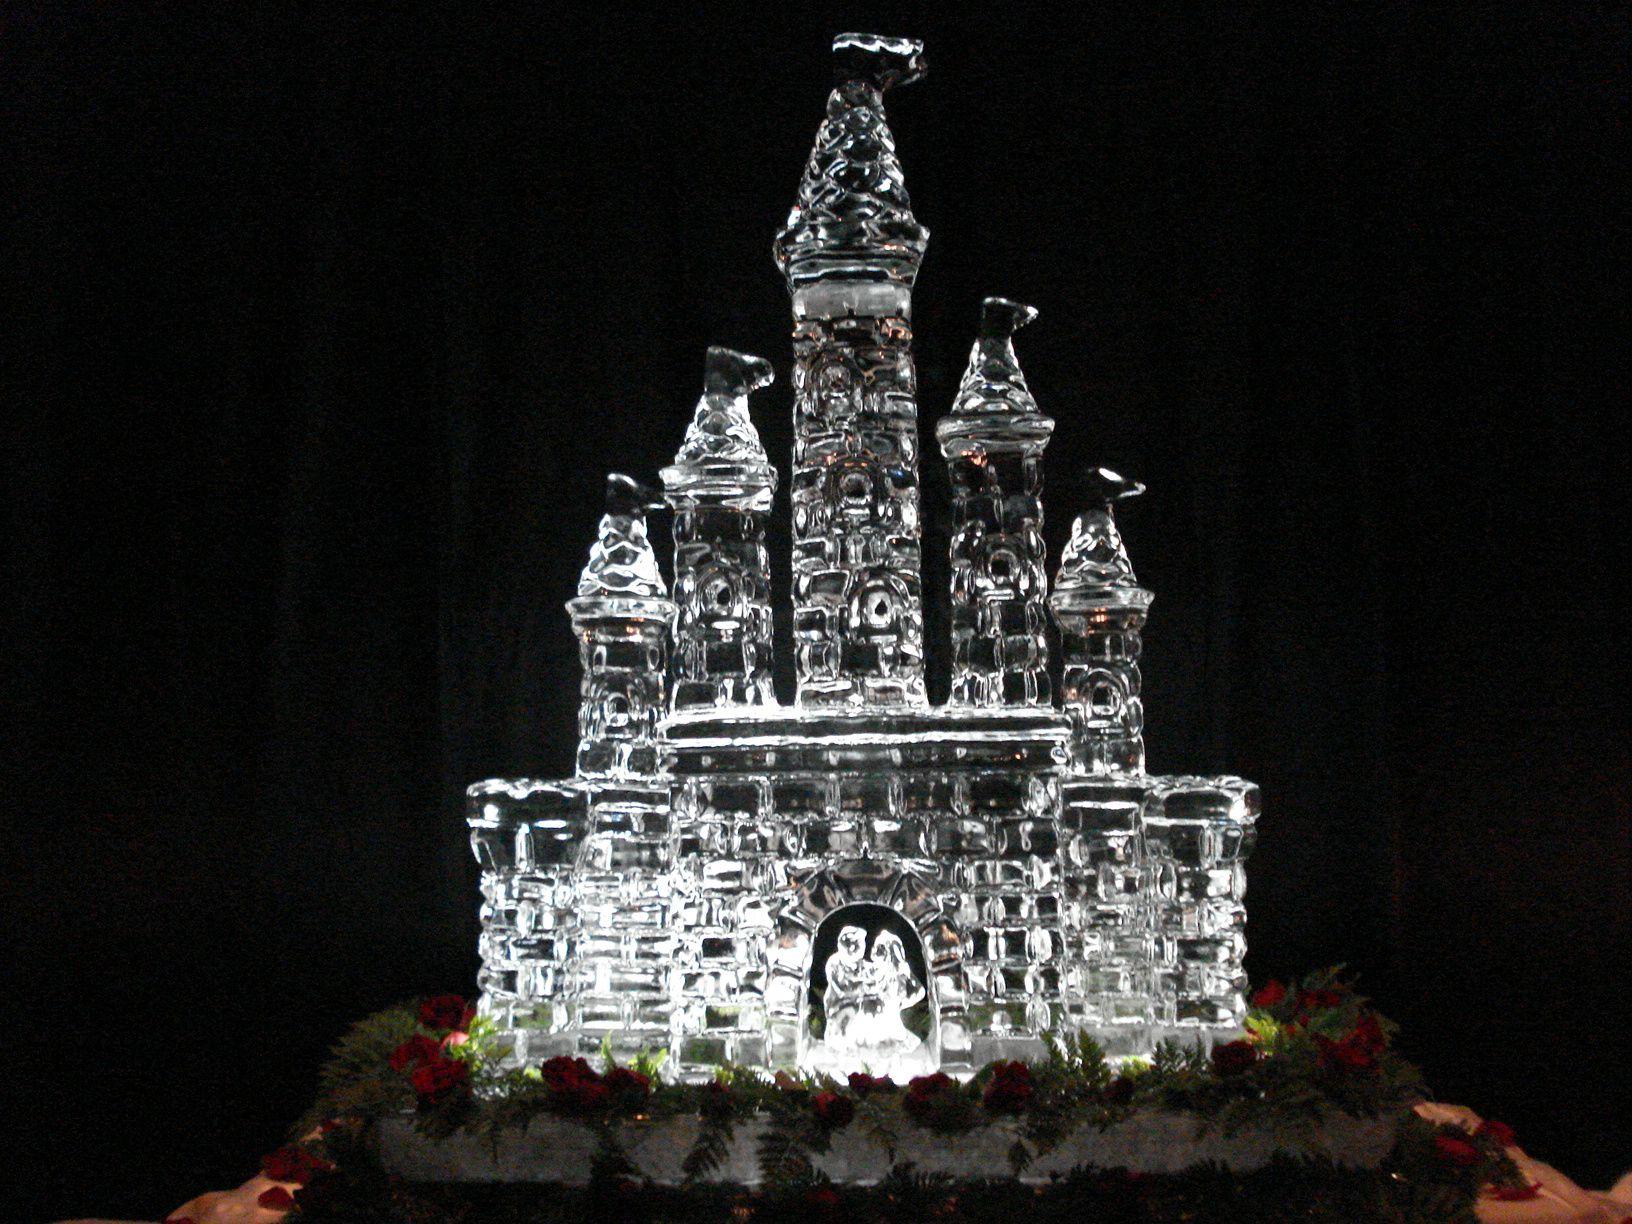 Castle Grande (With images) Ice sculptures, Appleton